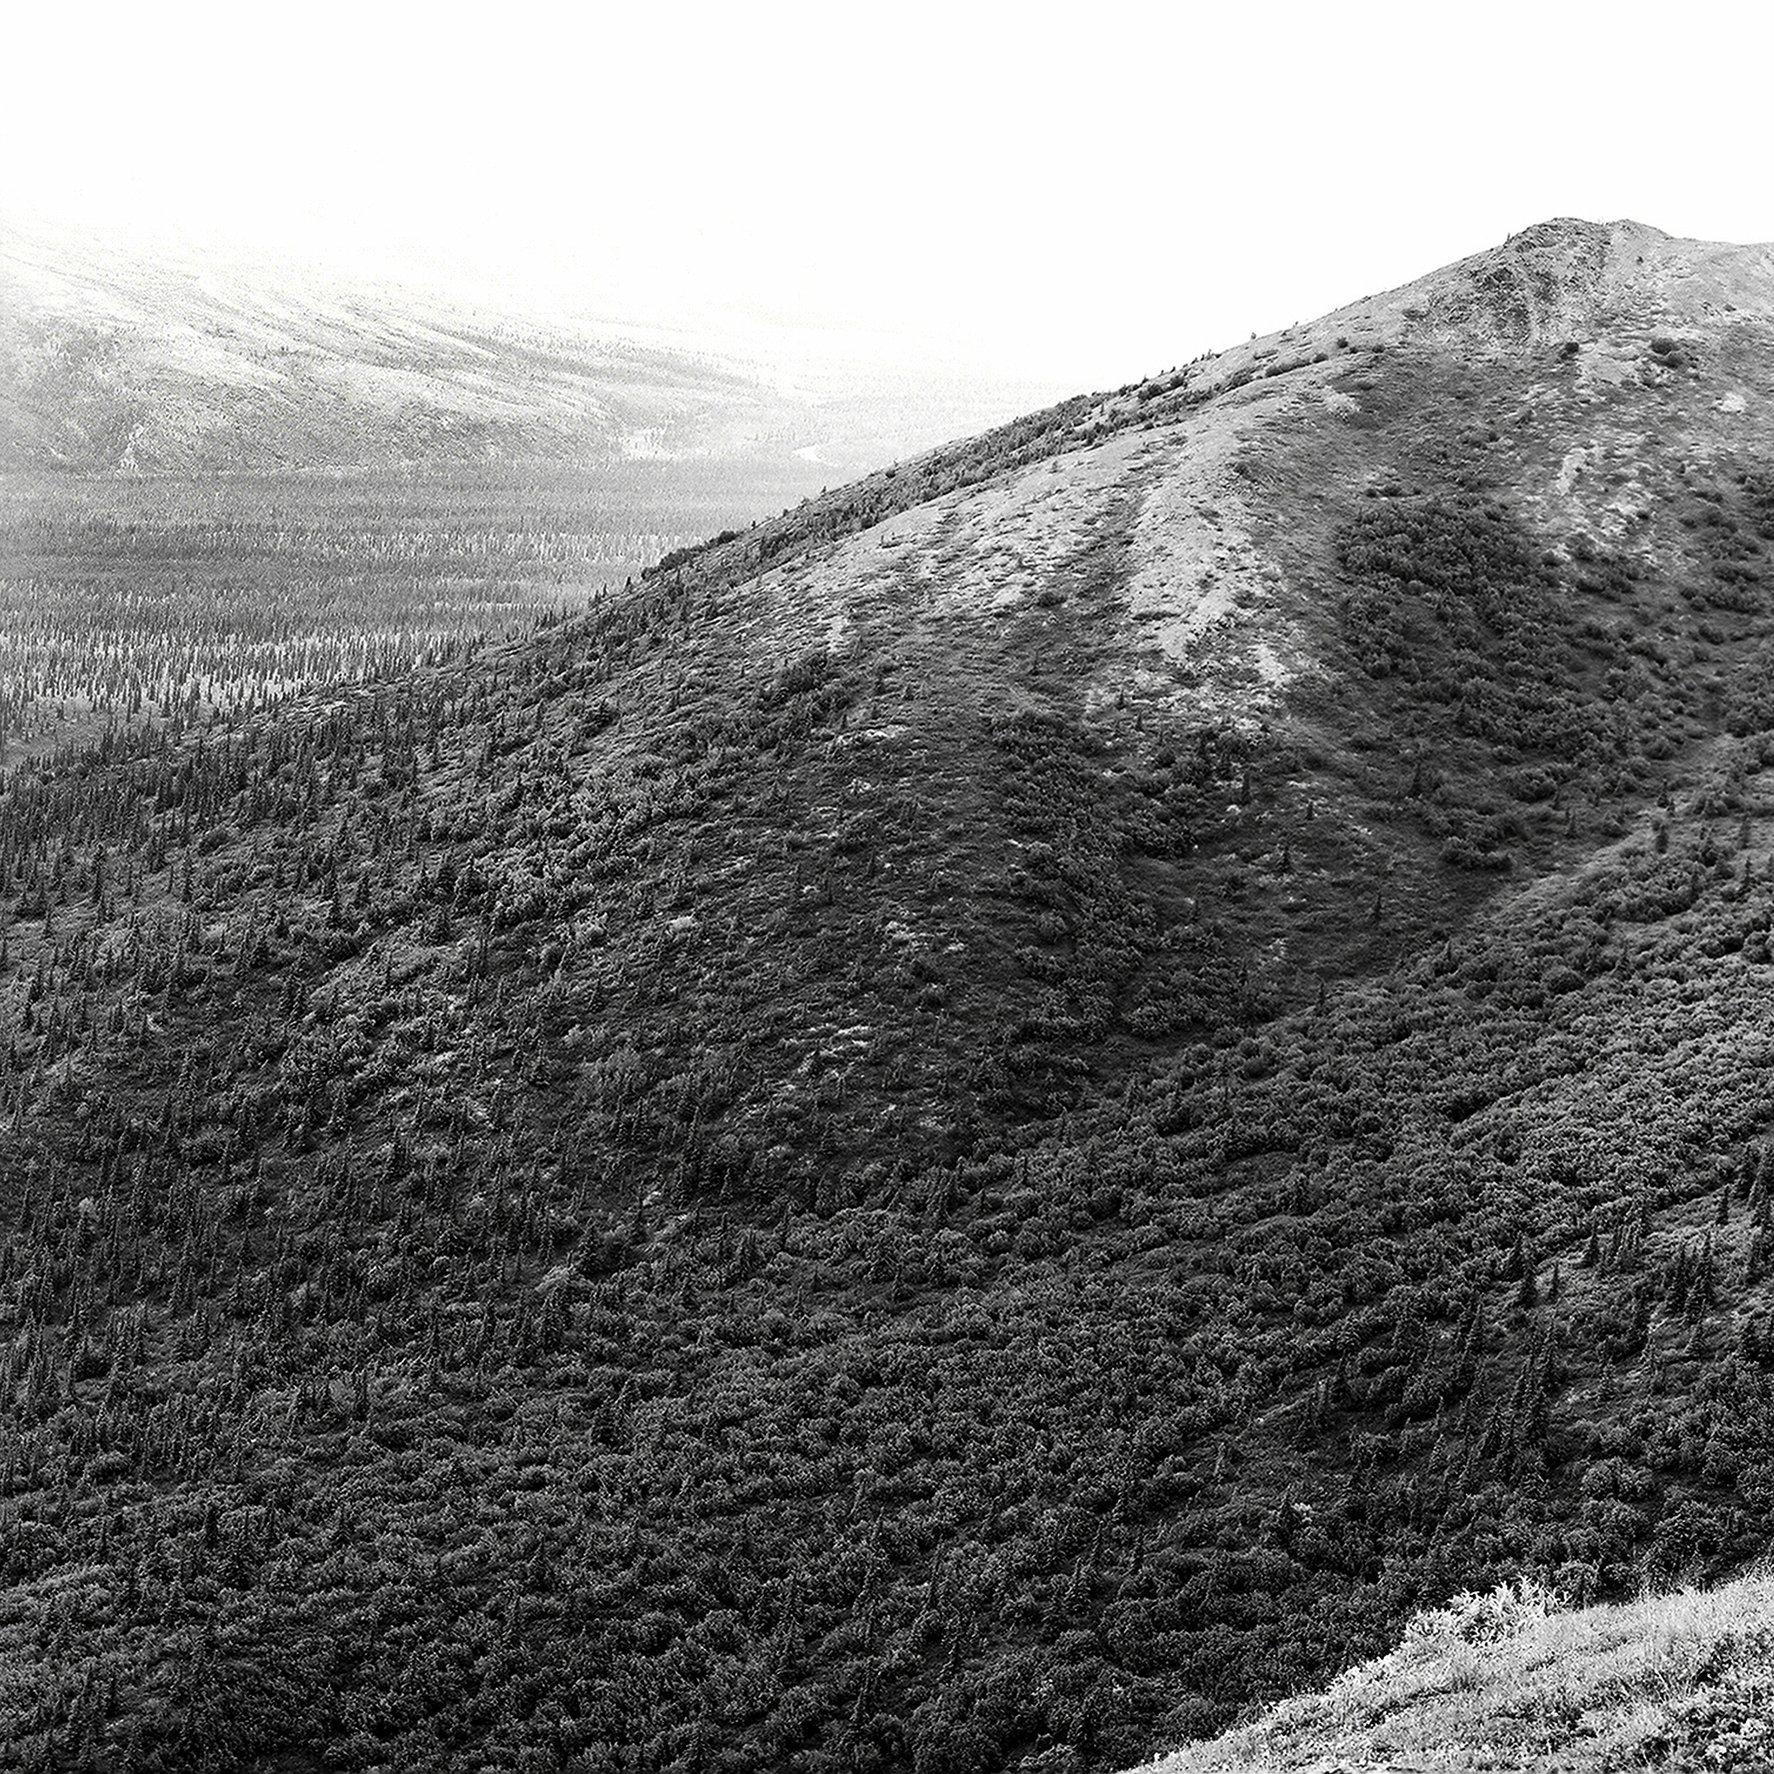 0001_denali national park.tif